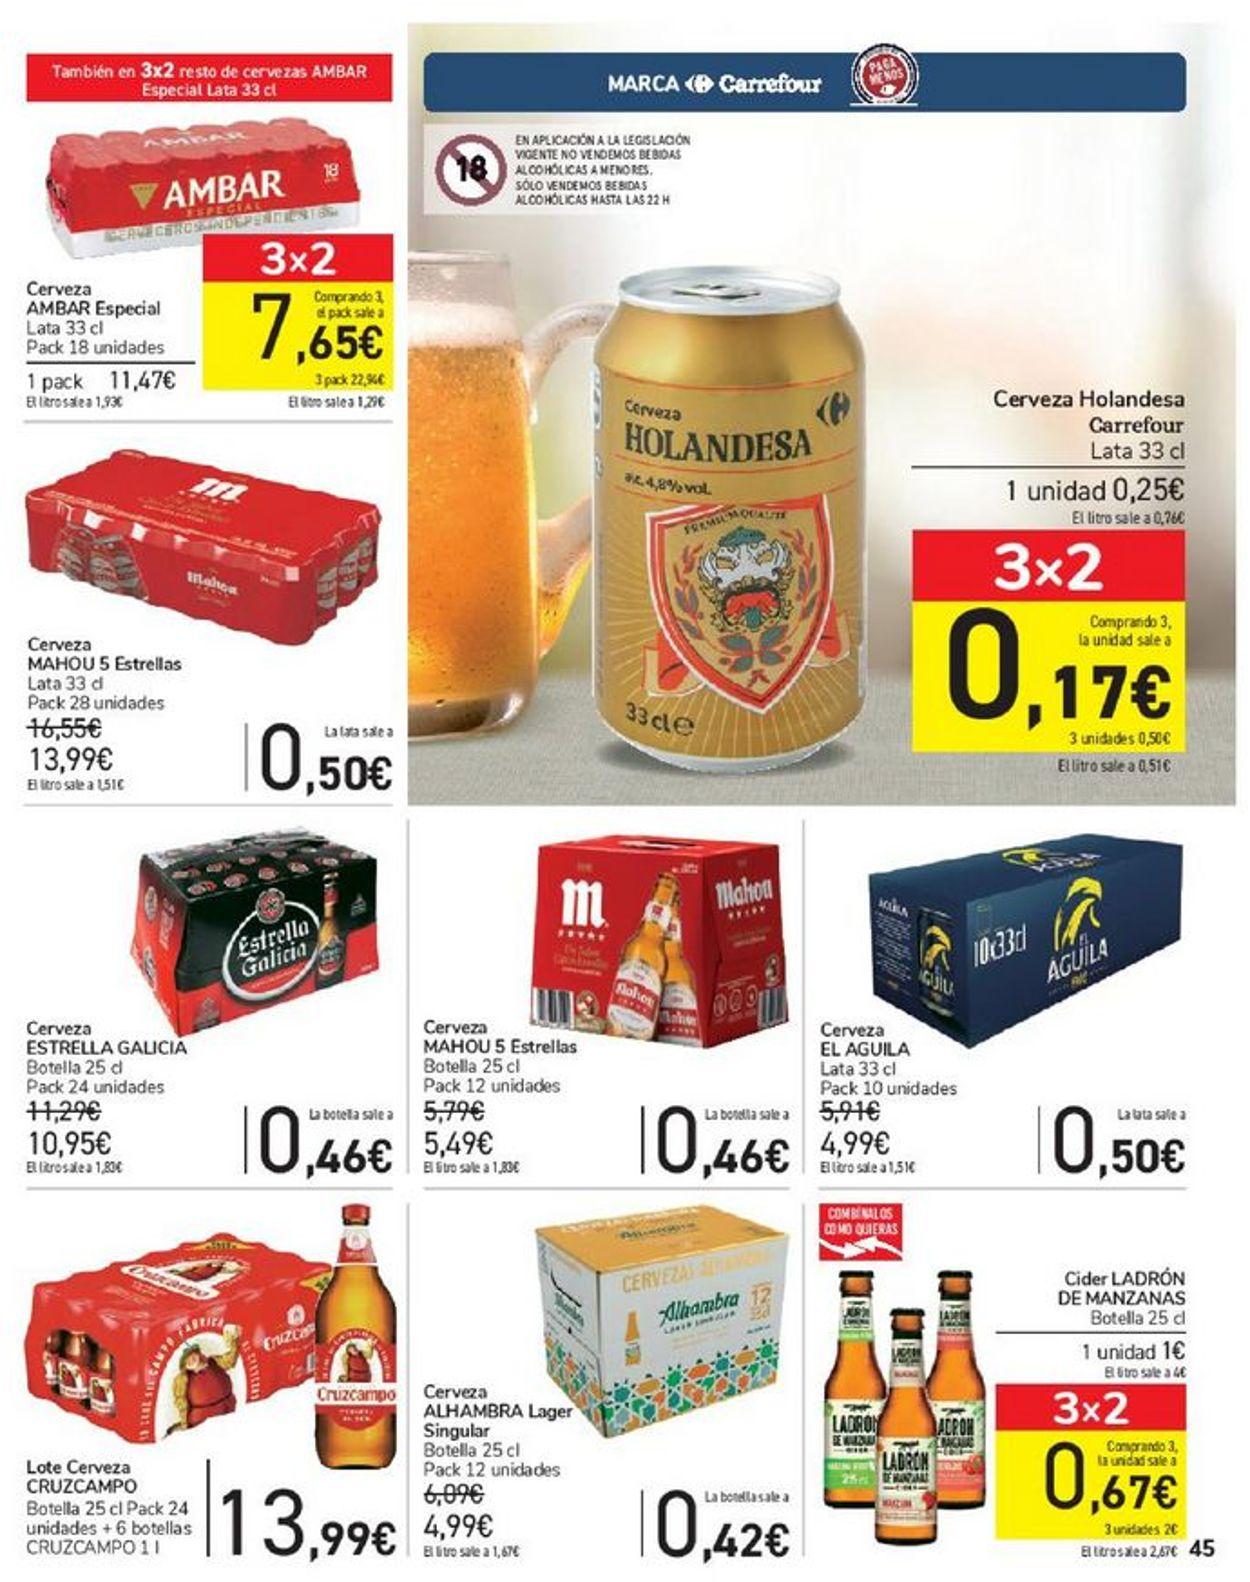 Carrefour Folleto - 30.06-15.07.2021 (Página 45)